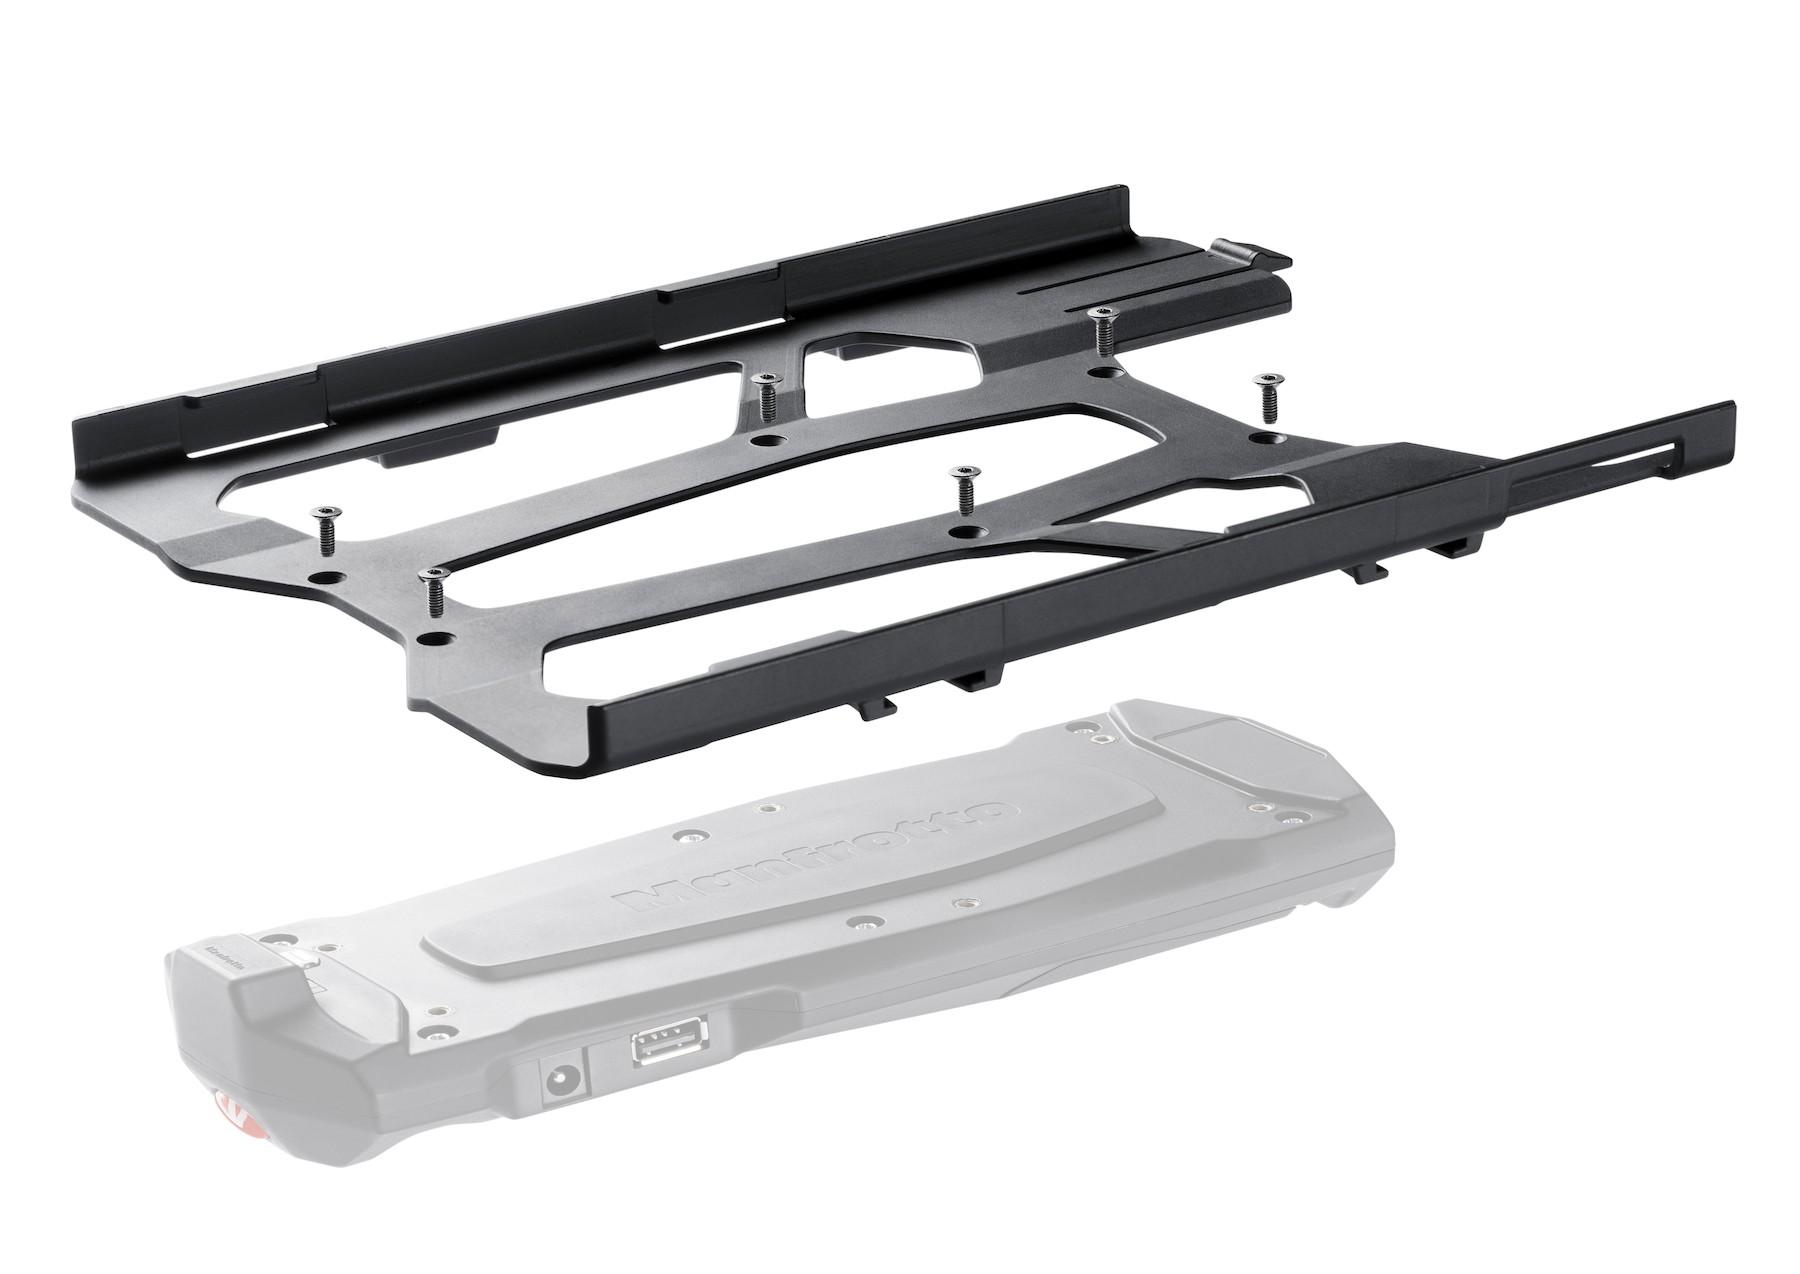 Converter Frame For iPad mini 3 and 2 - MVDDFM23